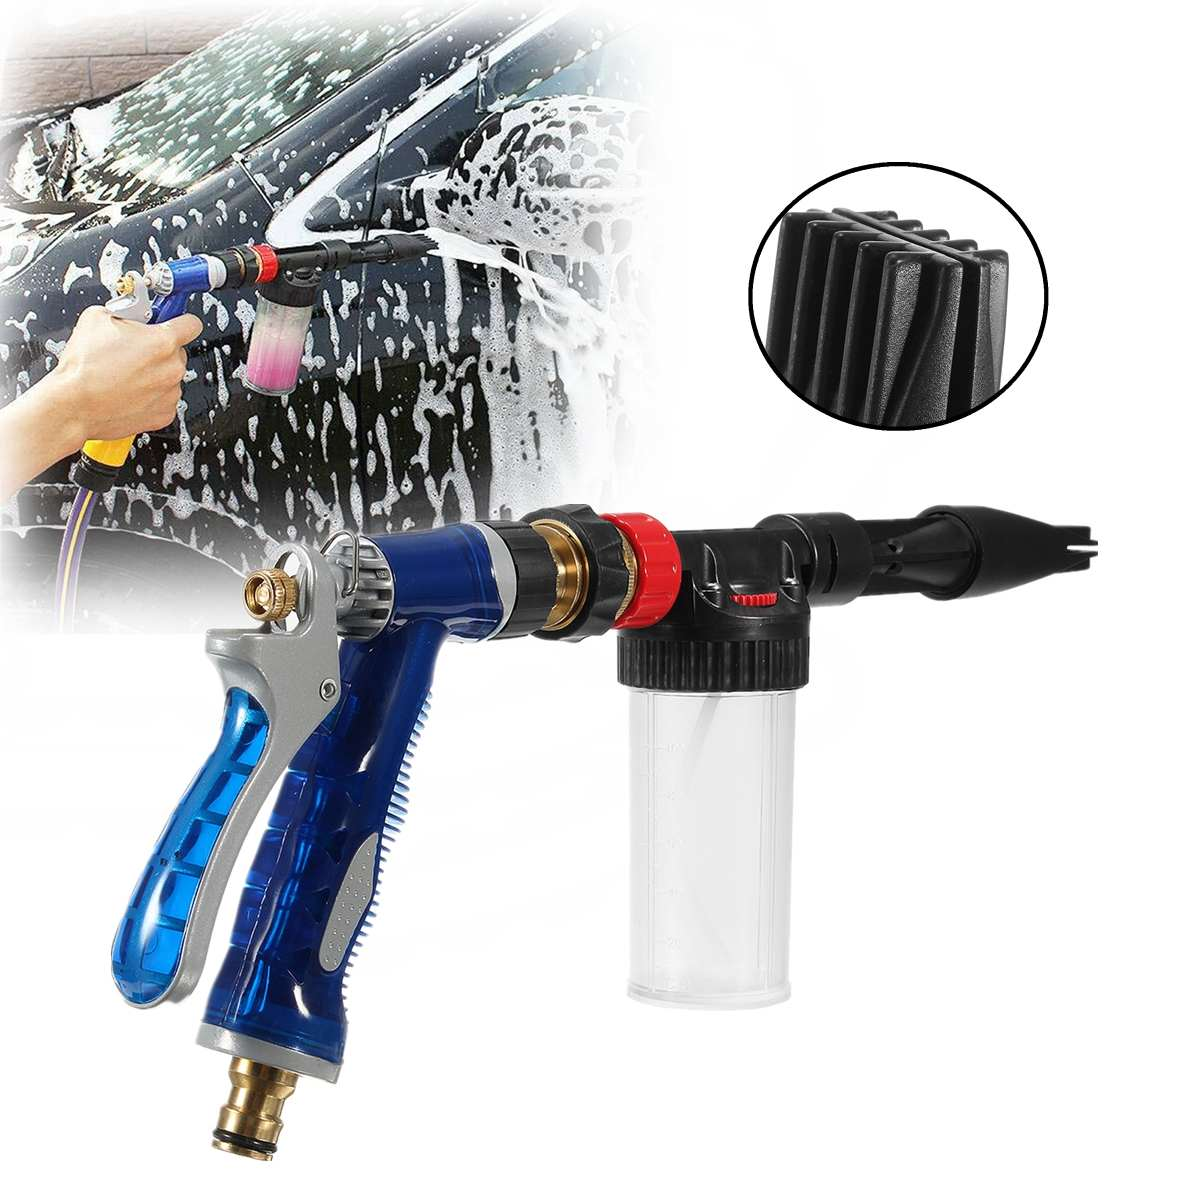 Adjustable 100ML Bottle Foam Lance Pressure Washer Car Wash Clean Spray Jet Multifunctional Professional Car Washer